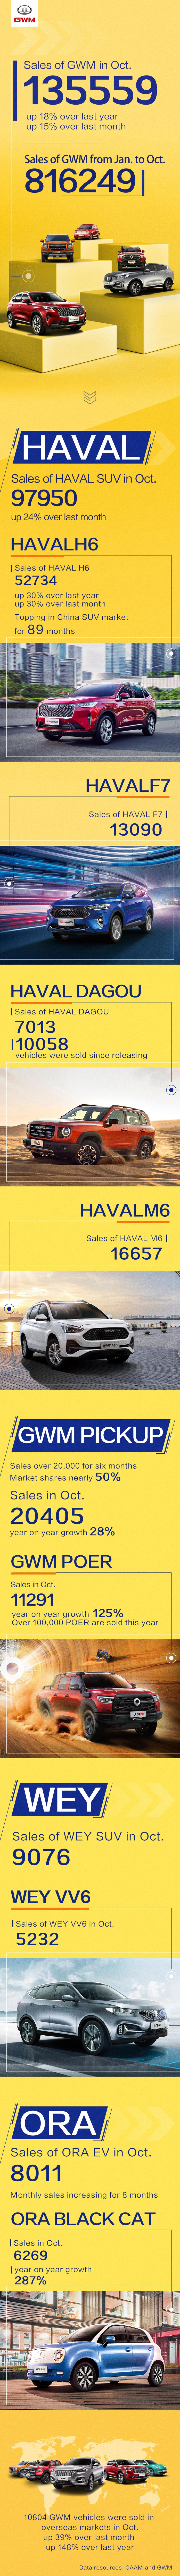 Great Wall Motors GWM Sales October 2020